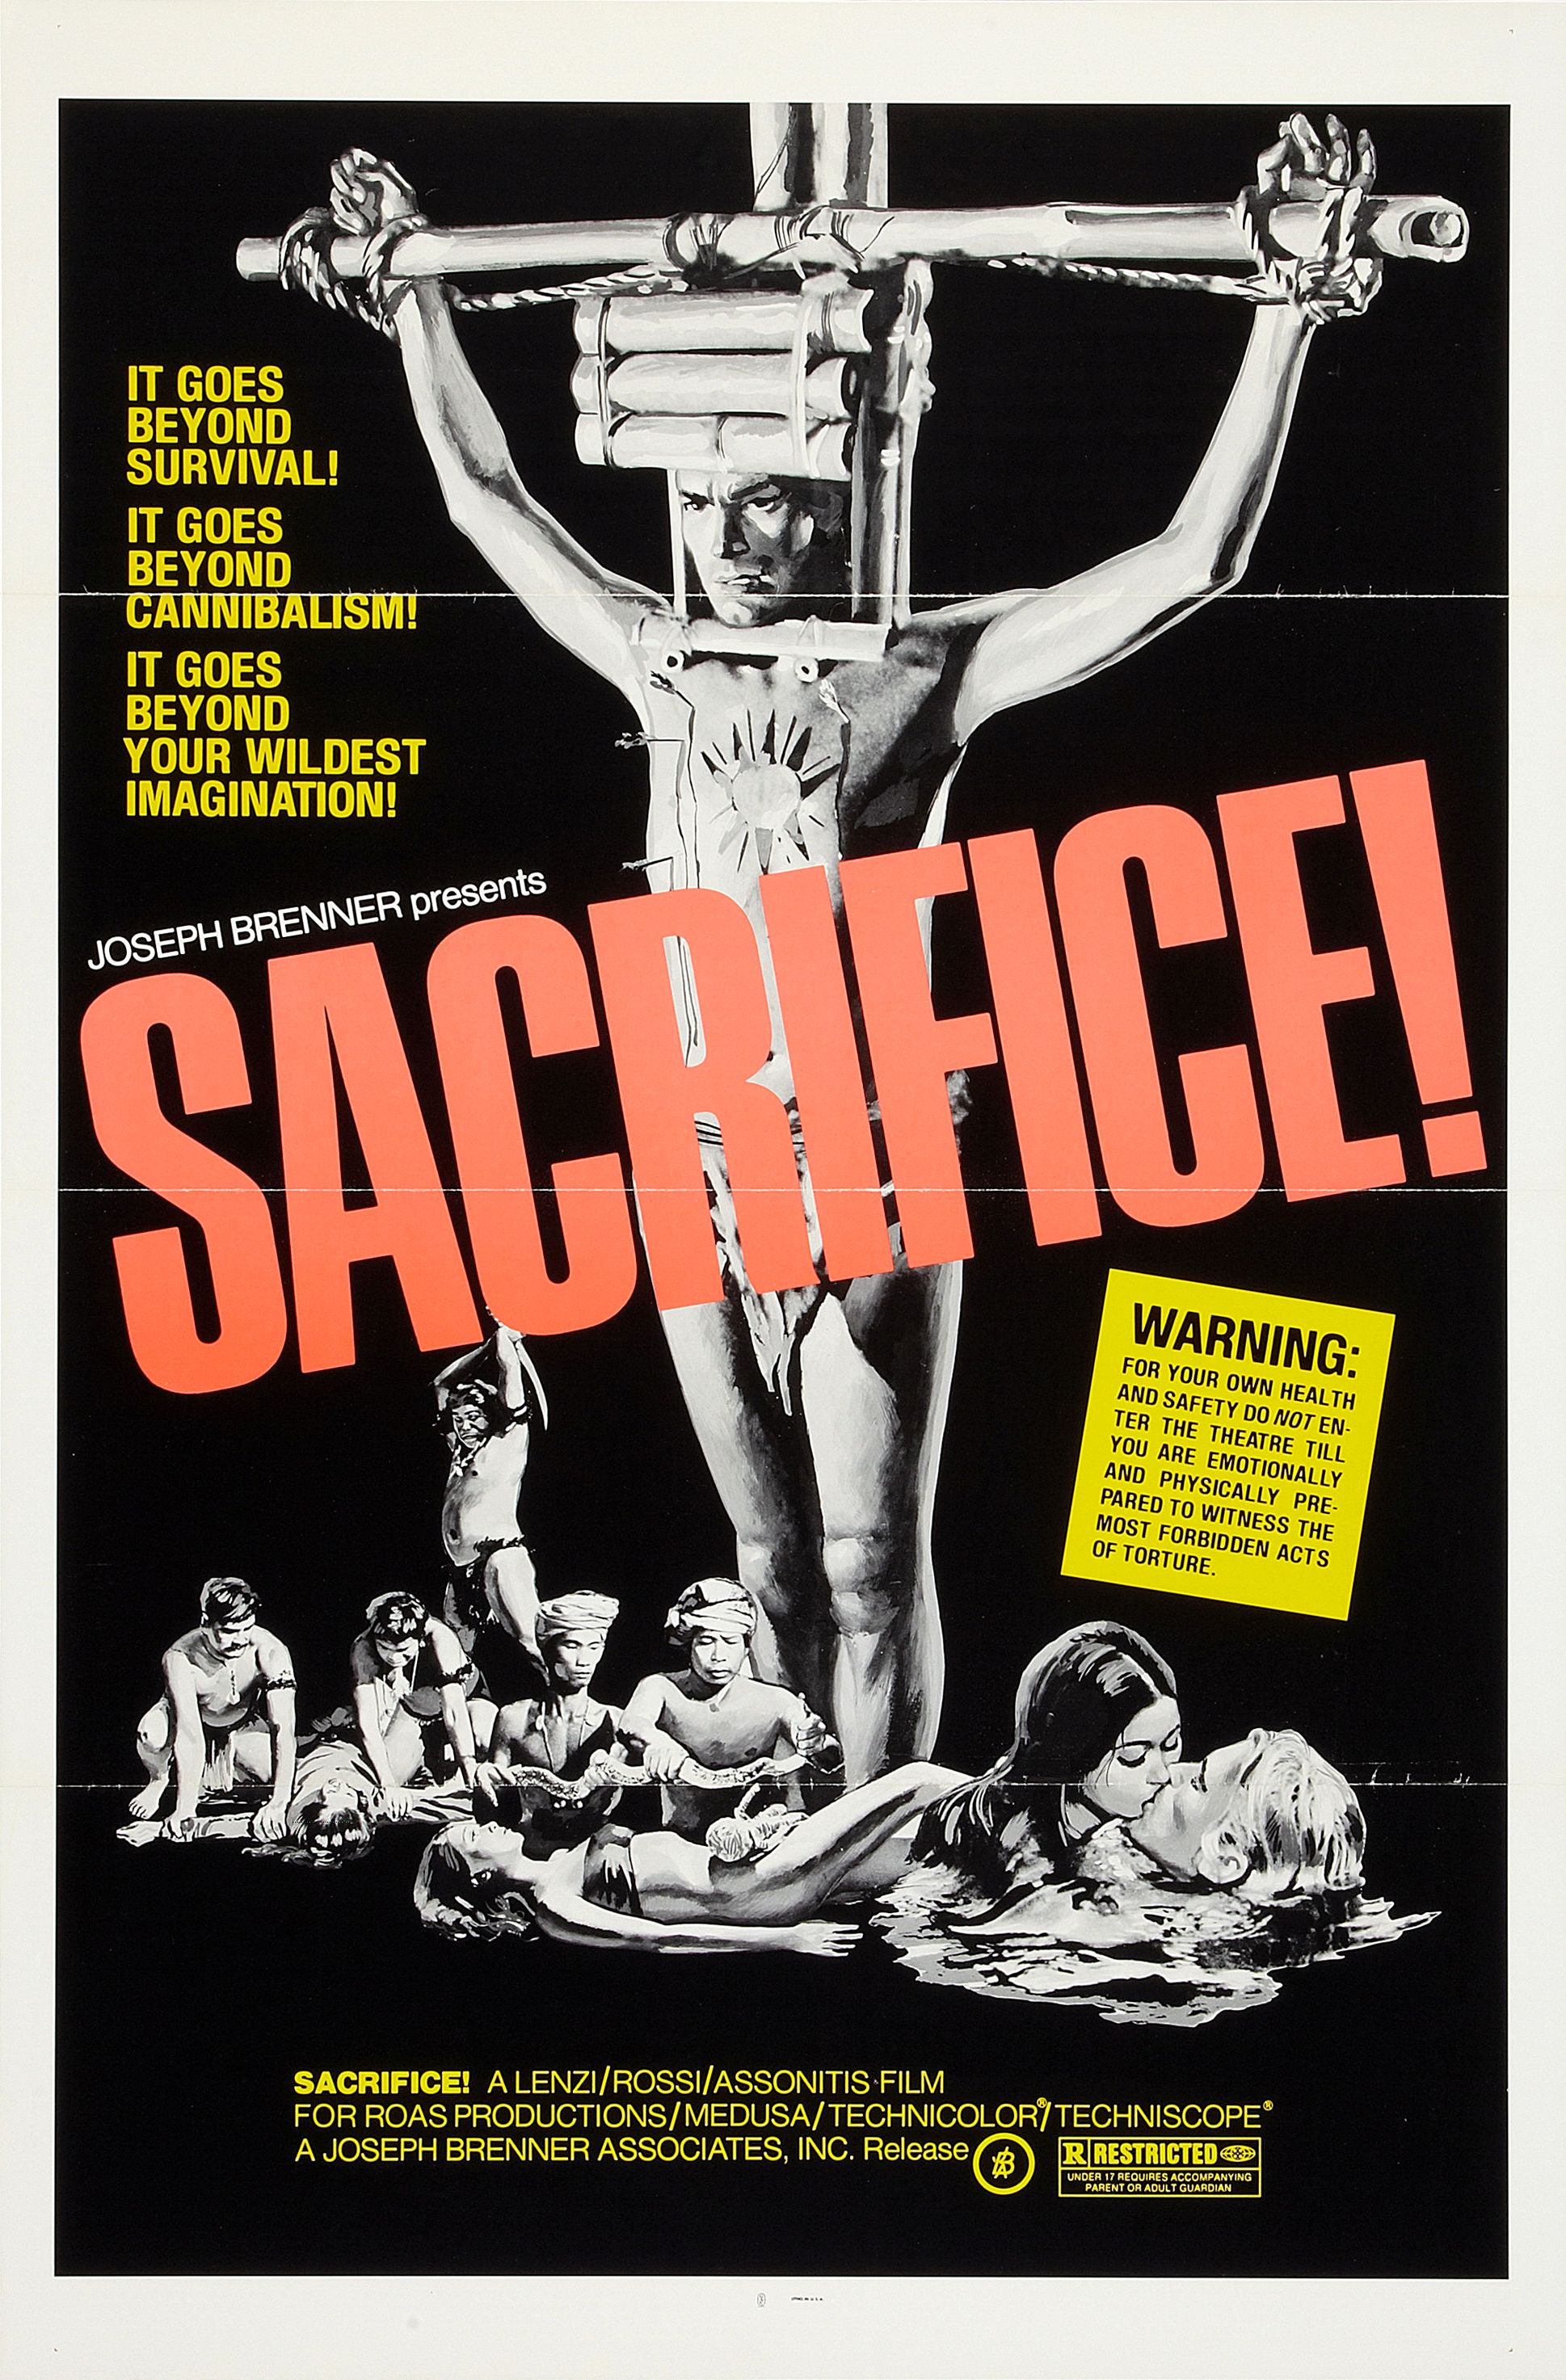 Movie poster #0 of 'Sacrifice!